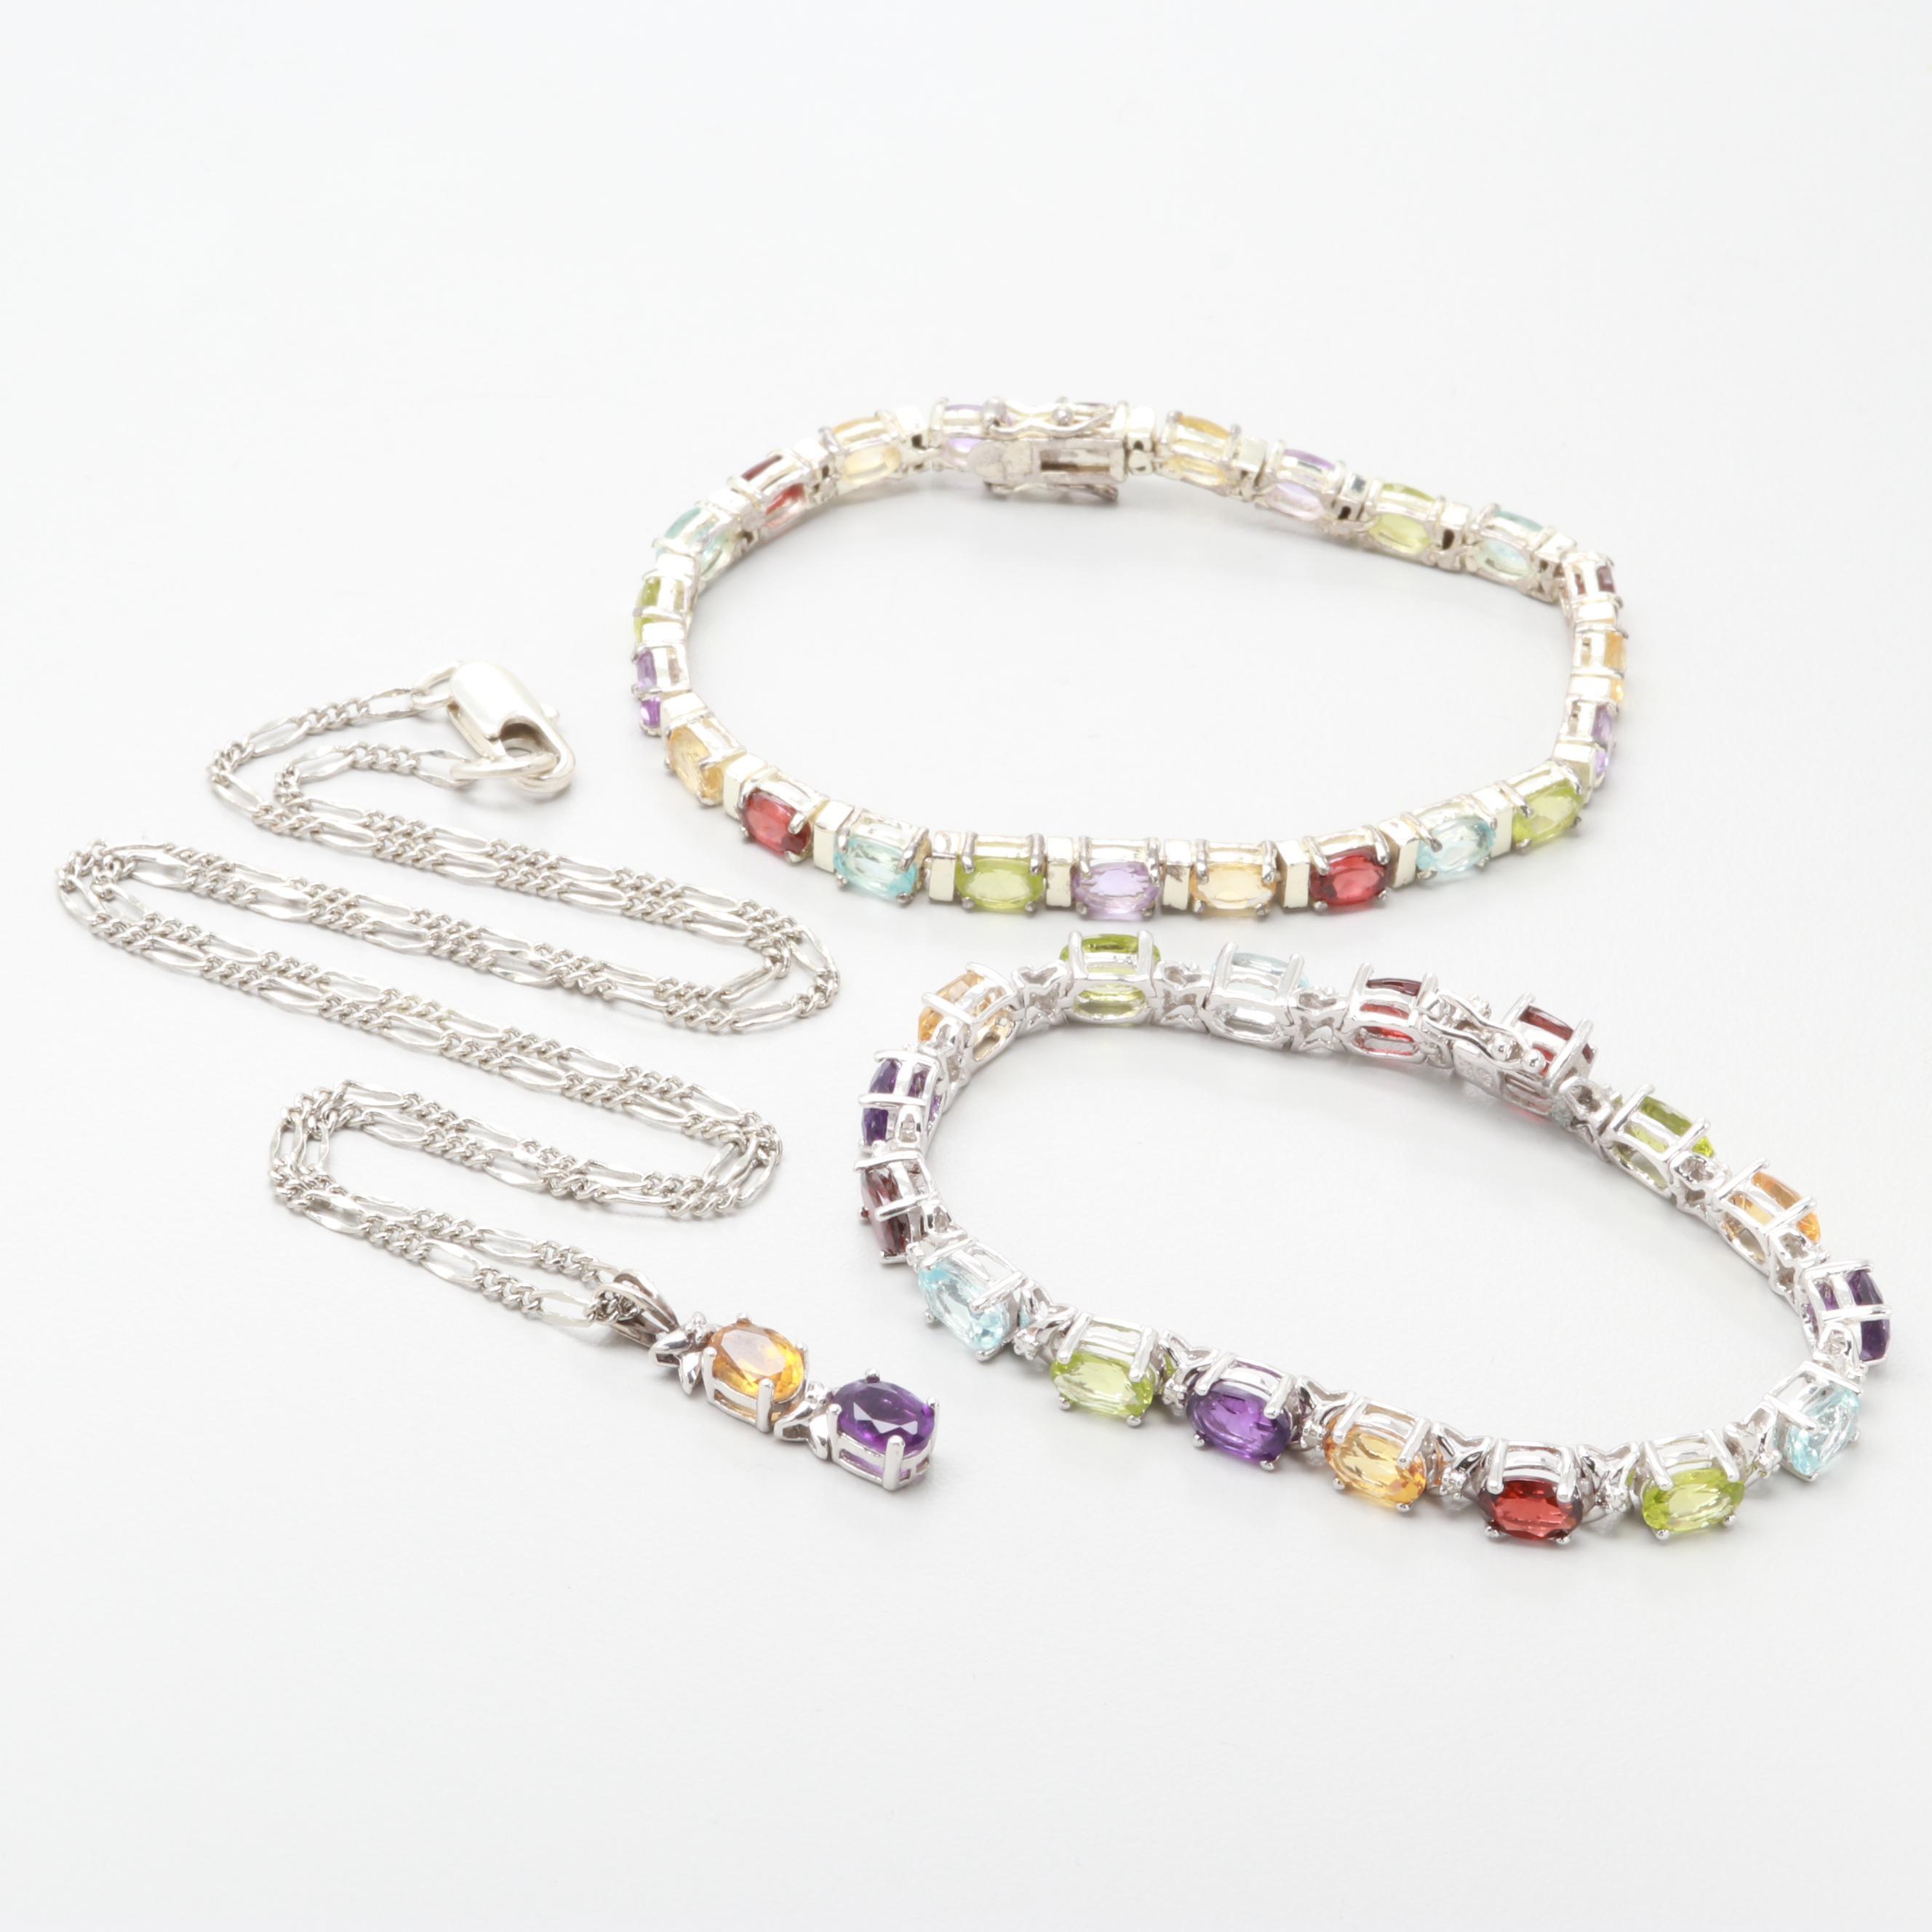 Silver Tone and Sterling Garnet, Peridot, Amethyst and Diamond Jewelry